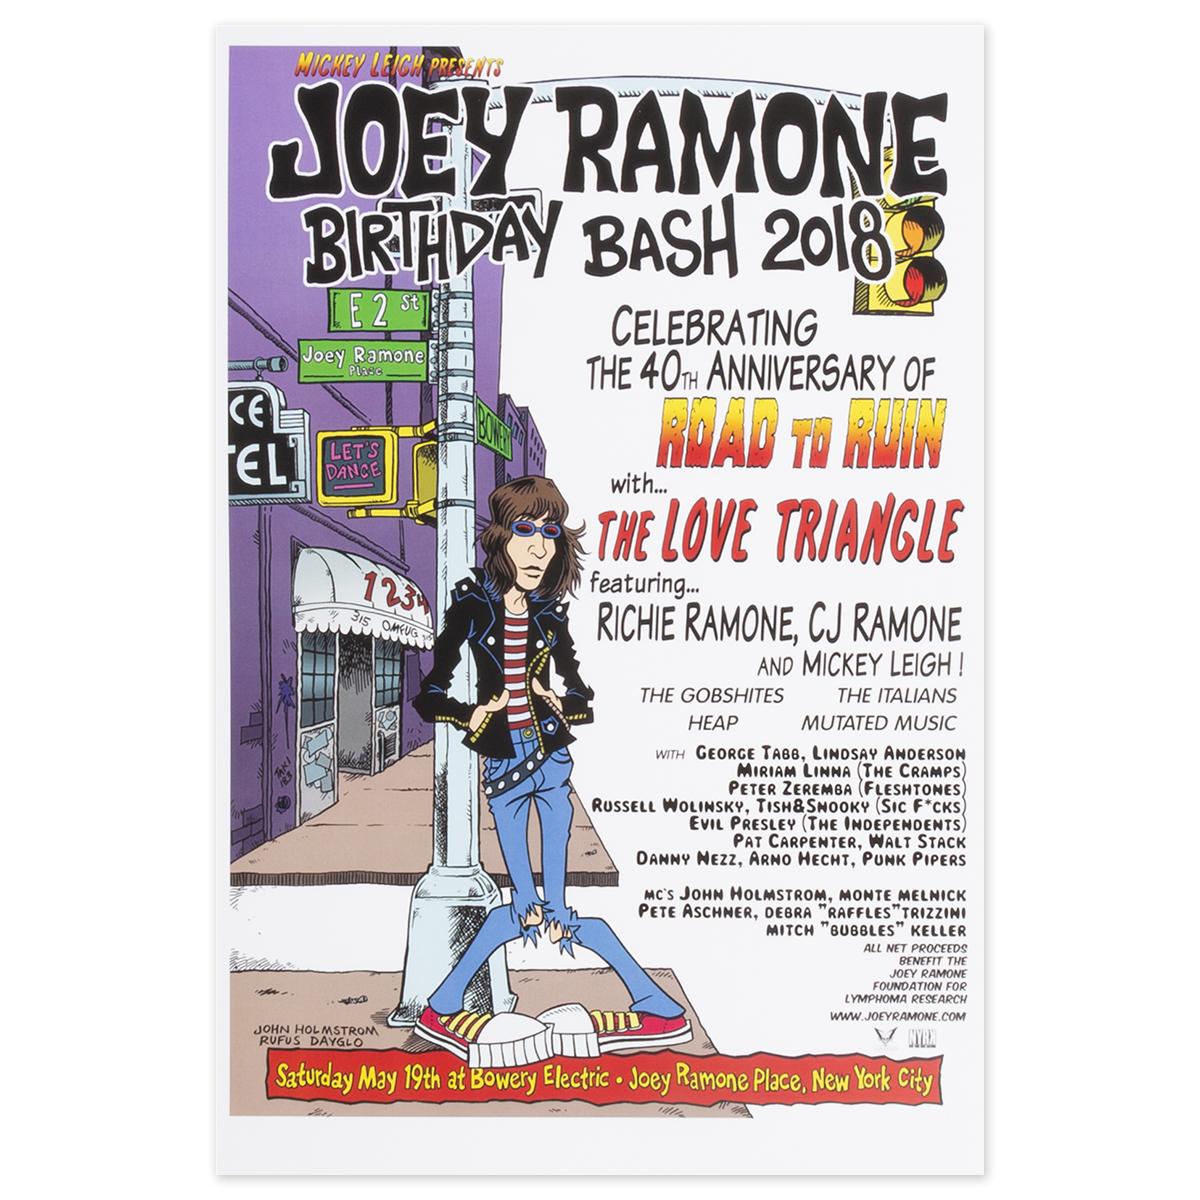 Joey Ramone 2018 Birthday Bash Poster